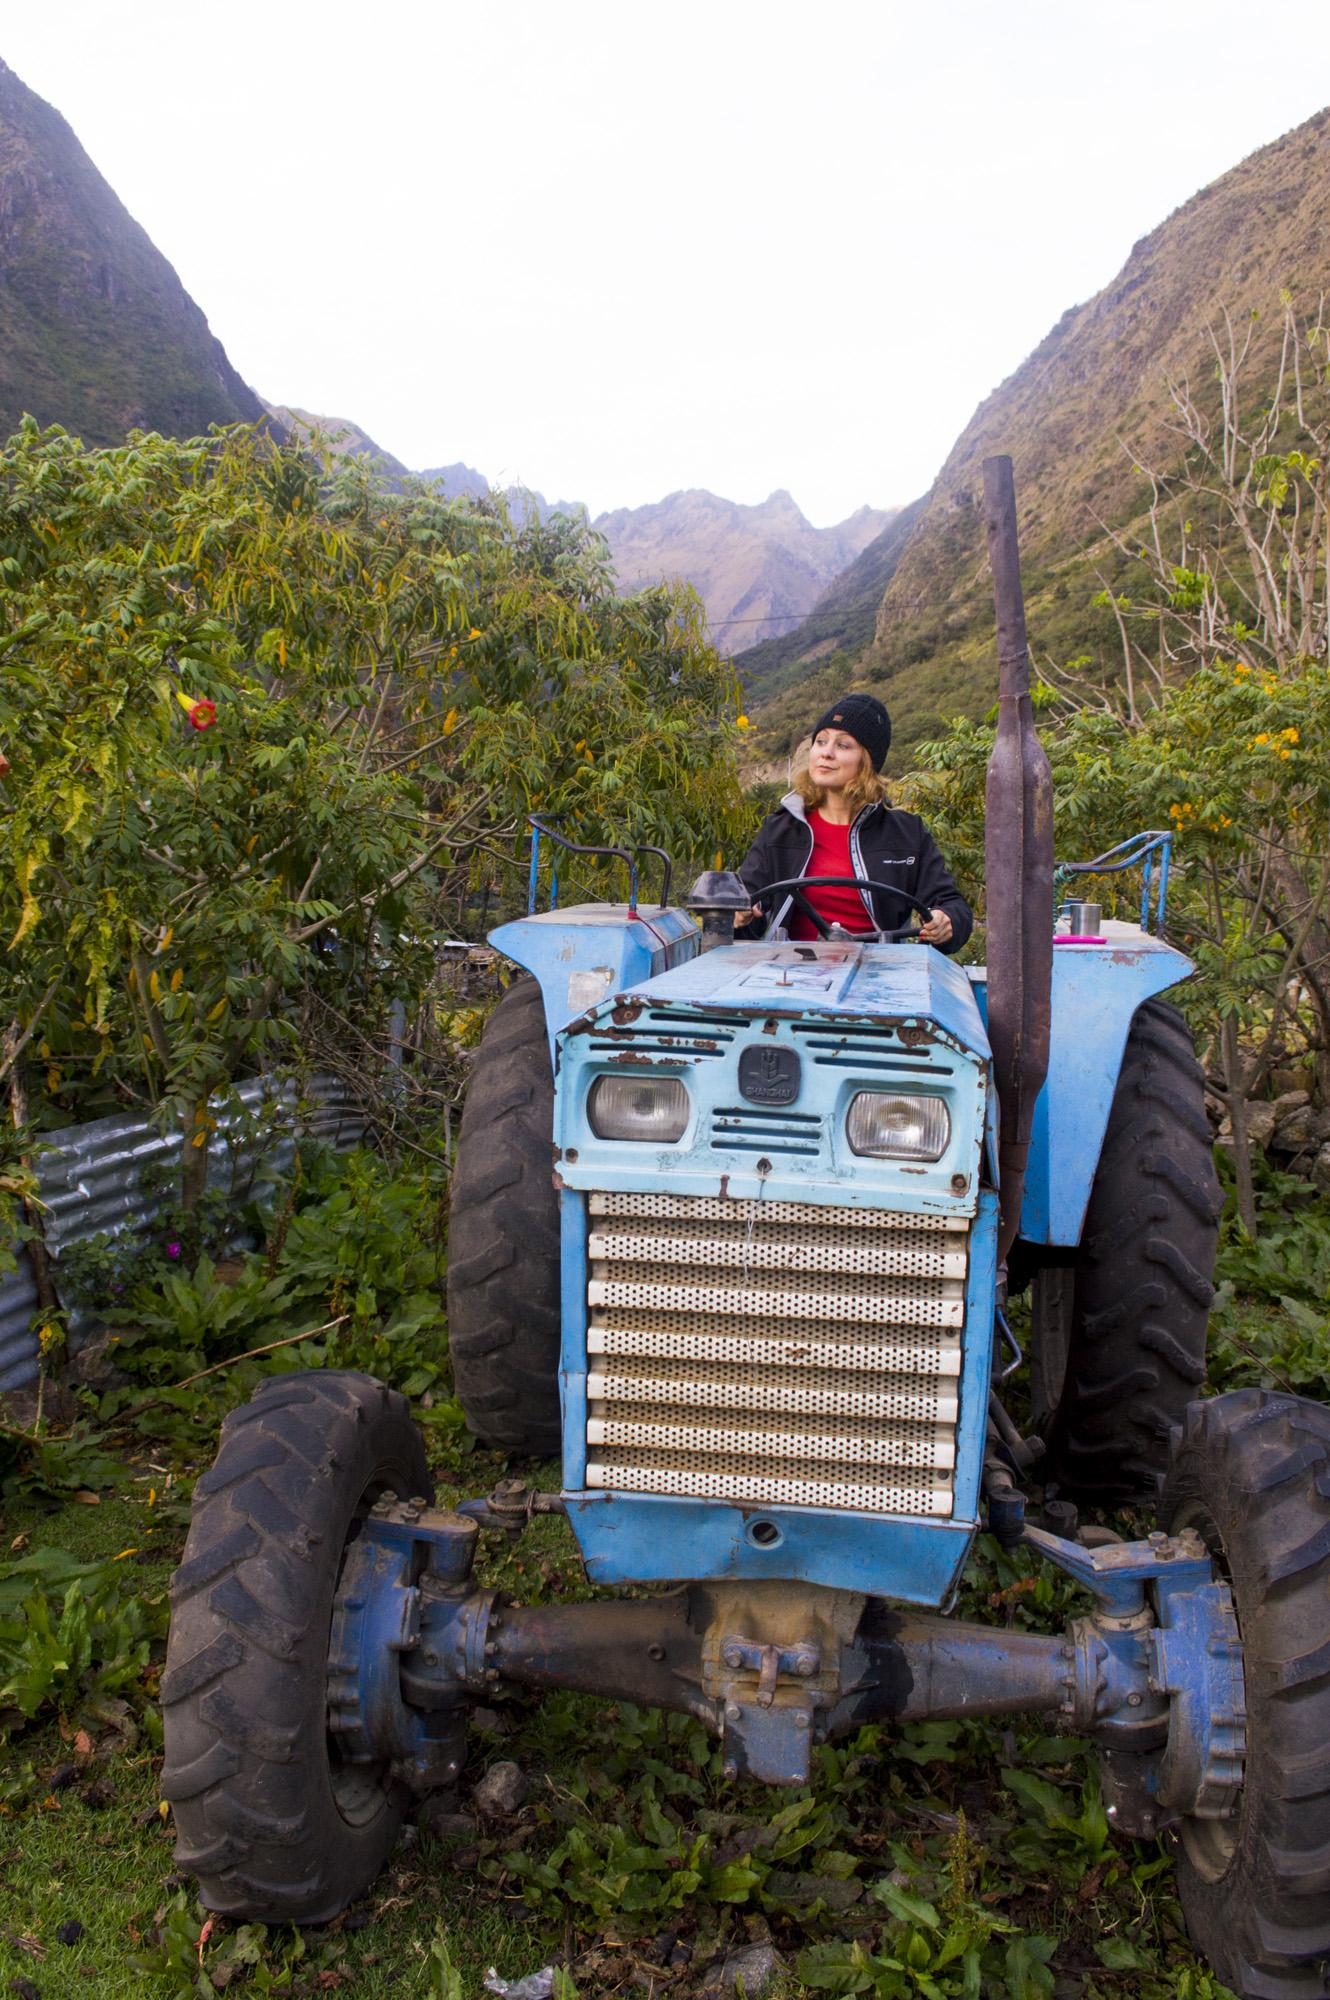 Inca 2 kris on tractor.jpg